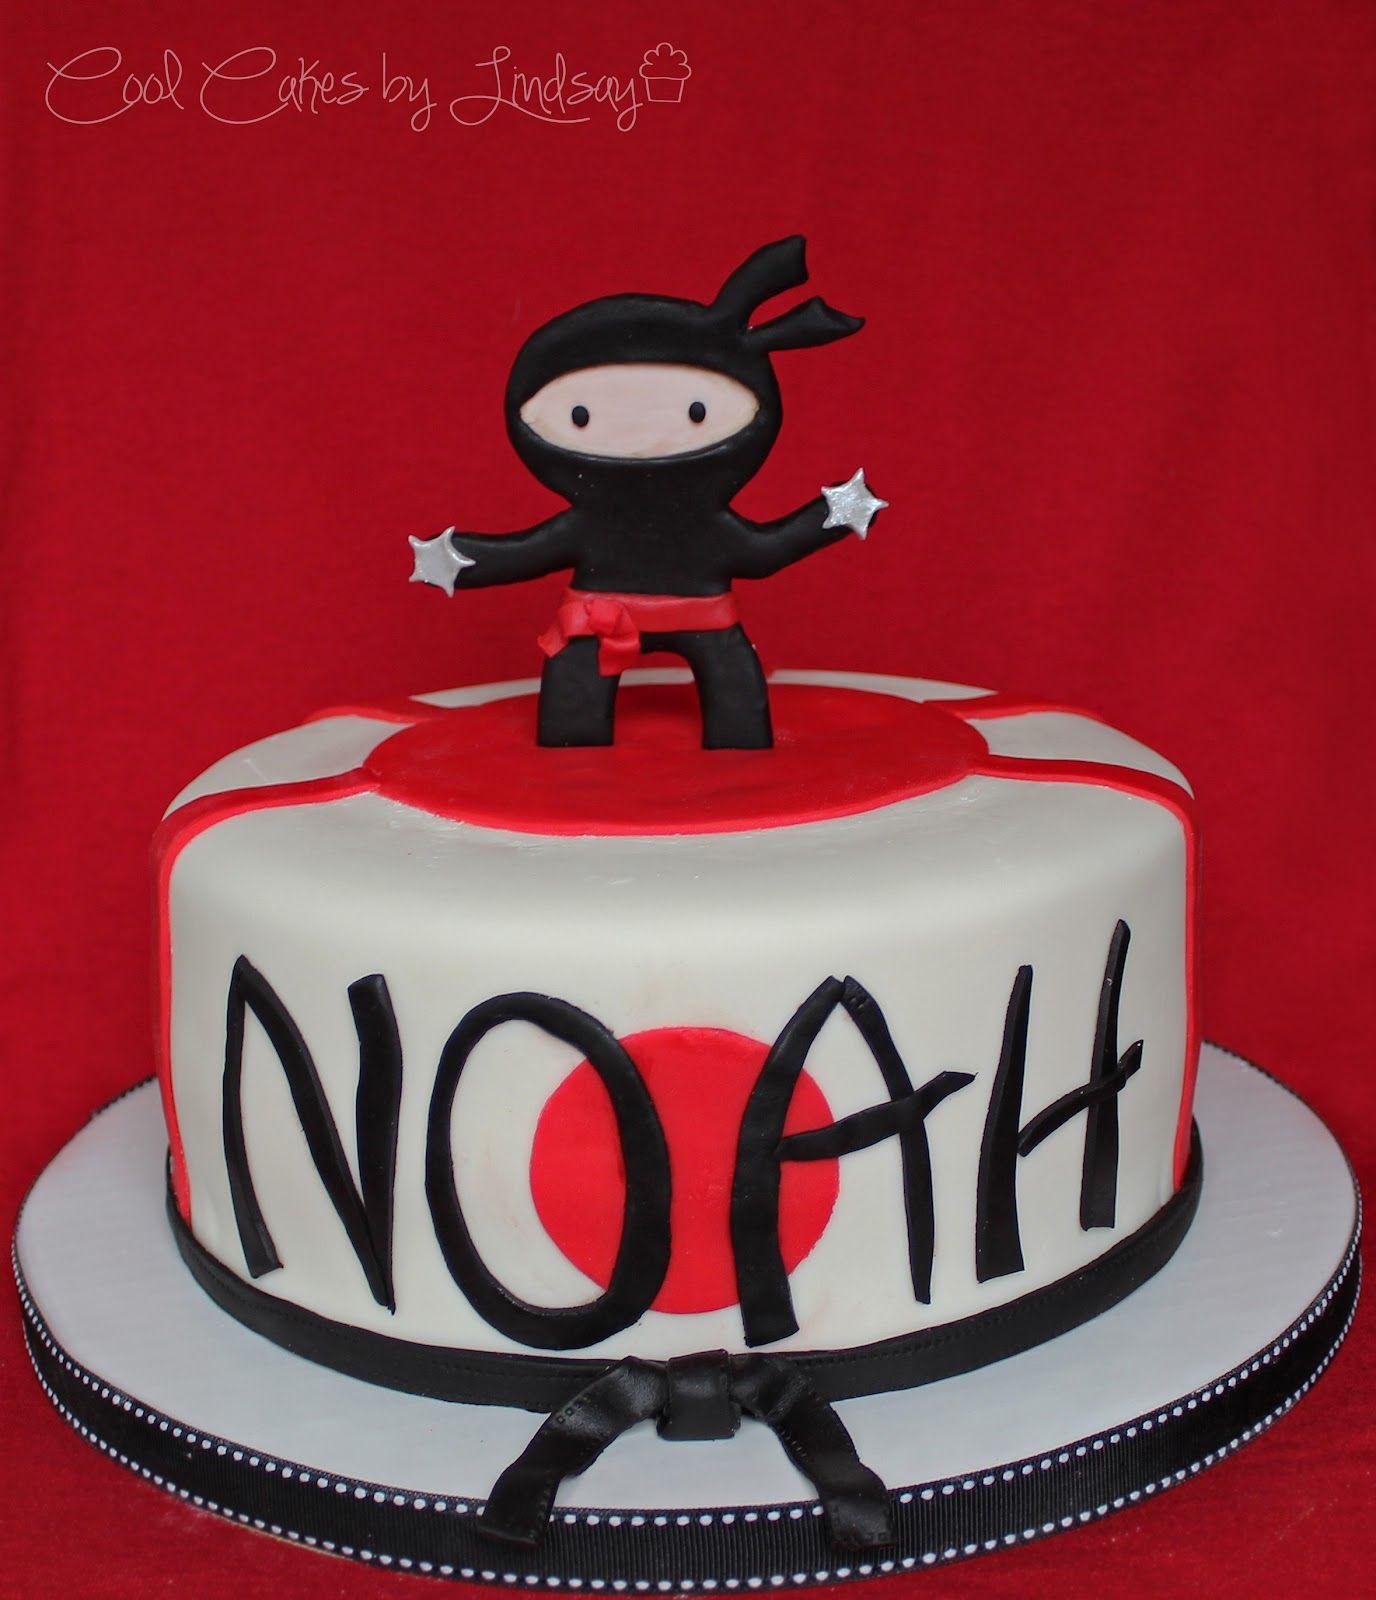 Miraculous Another Ninja Cake Idea Cute Ninja Birthday Cake Birthday Cards Printable Inklcafe Filternl